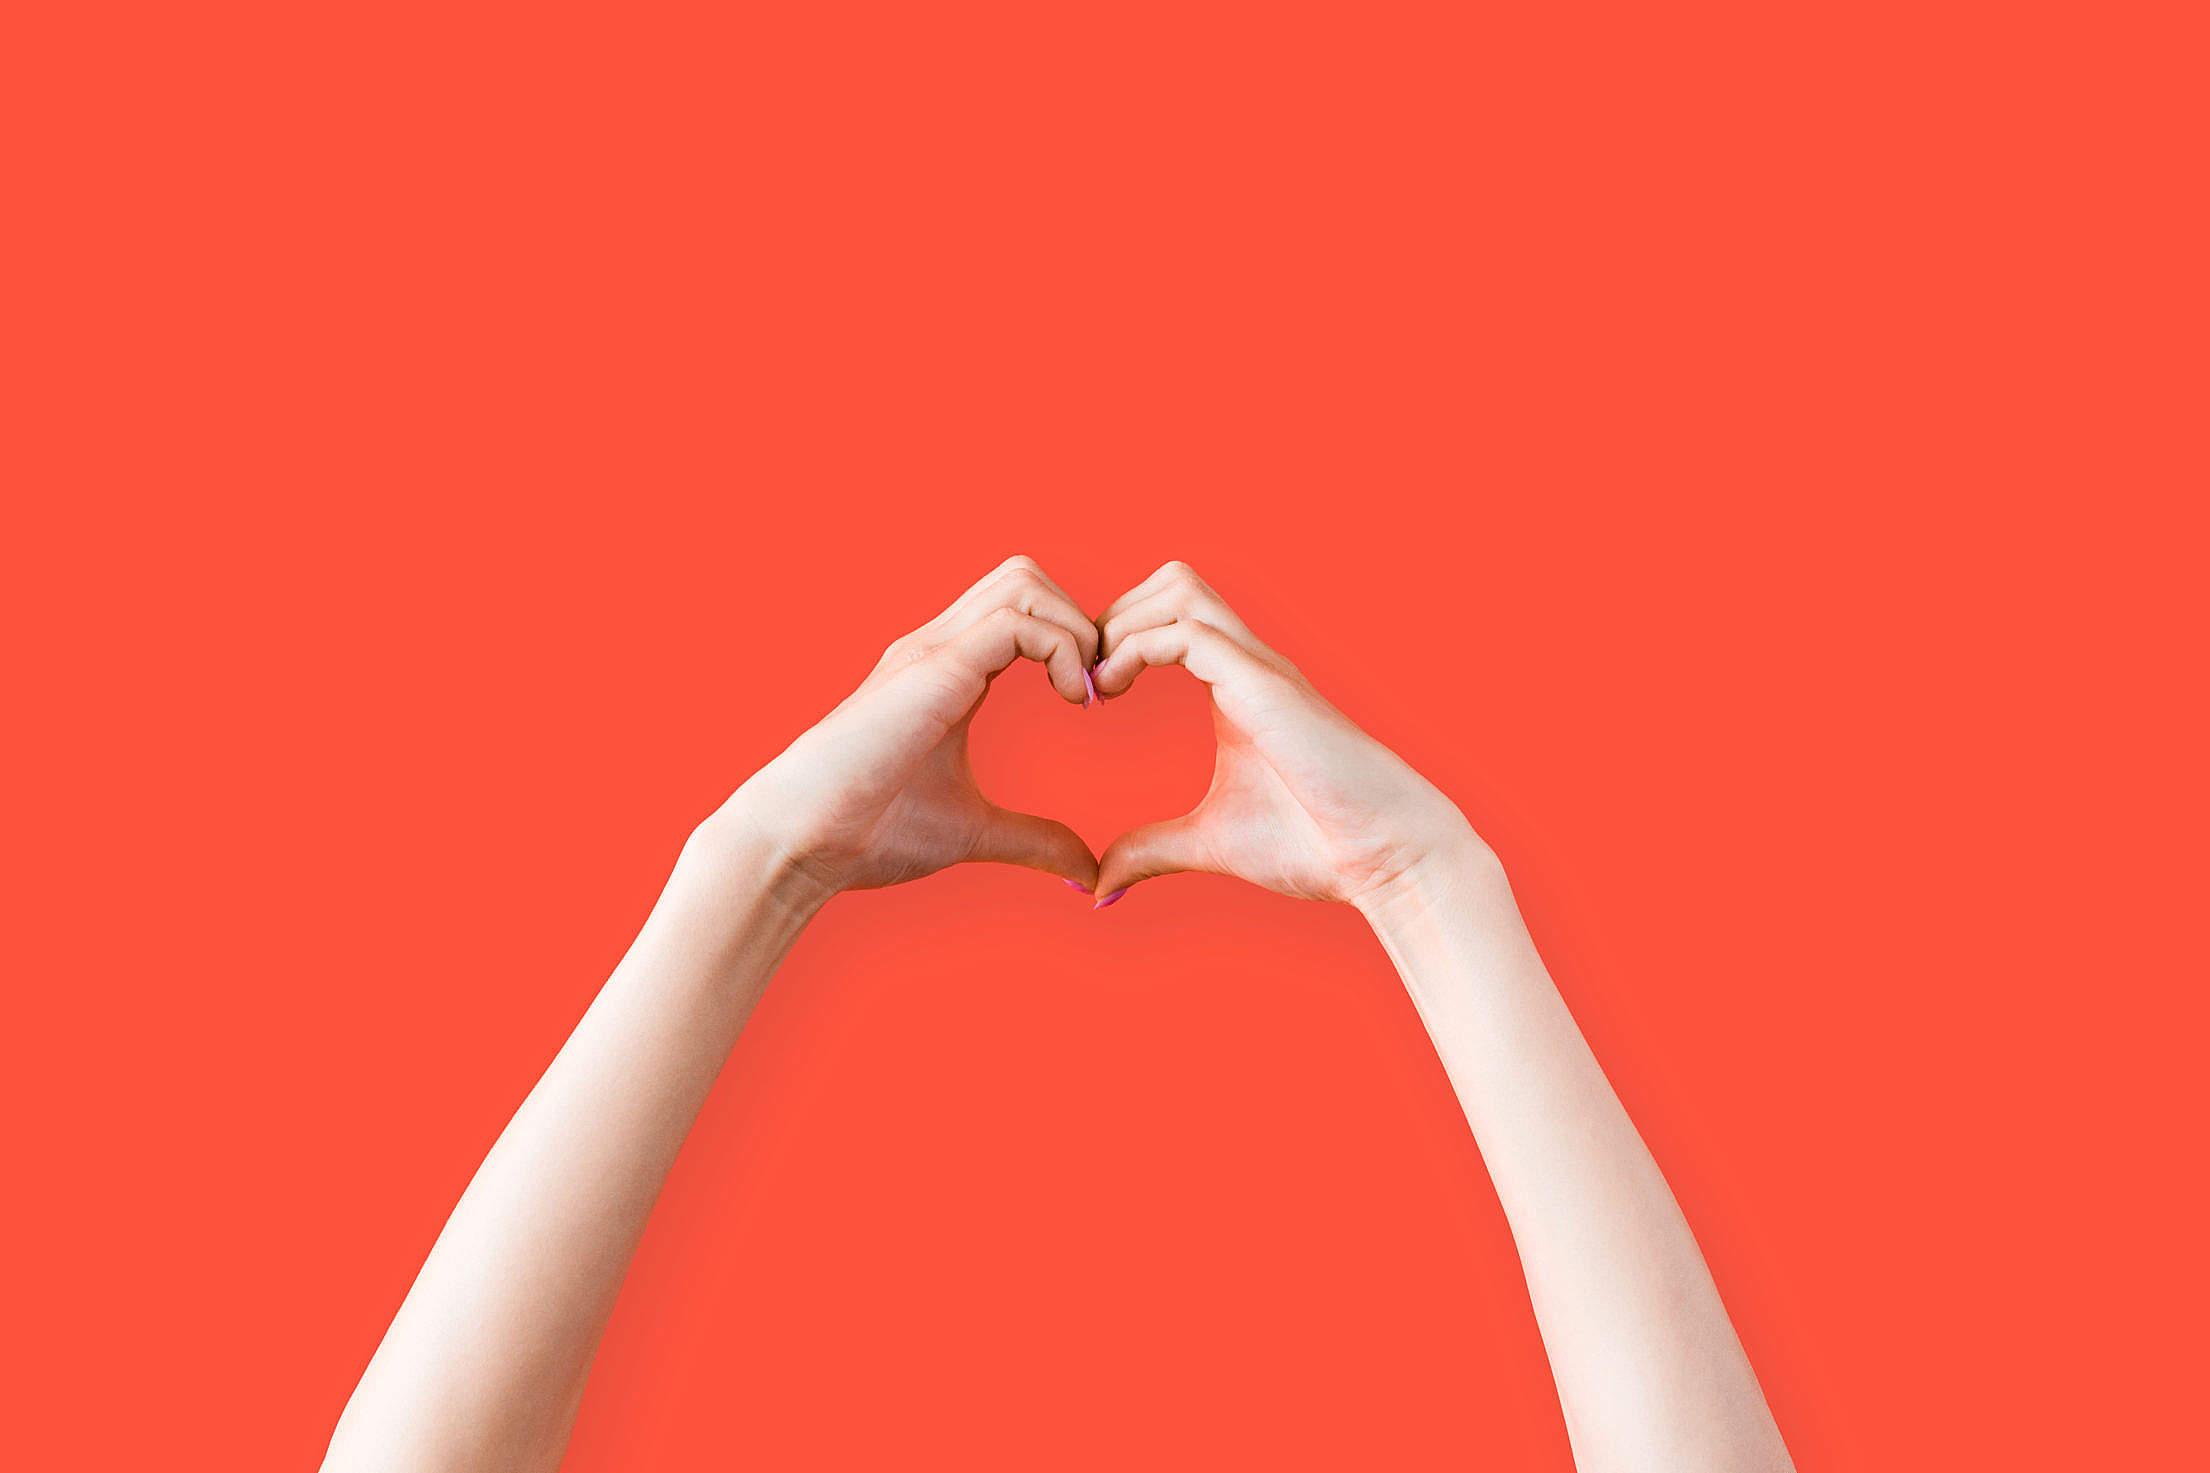 Female Hands Love Heart Symbol Free Stock Photo